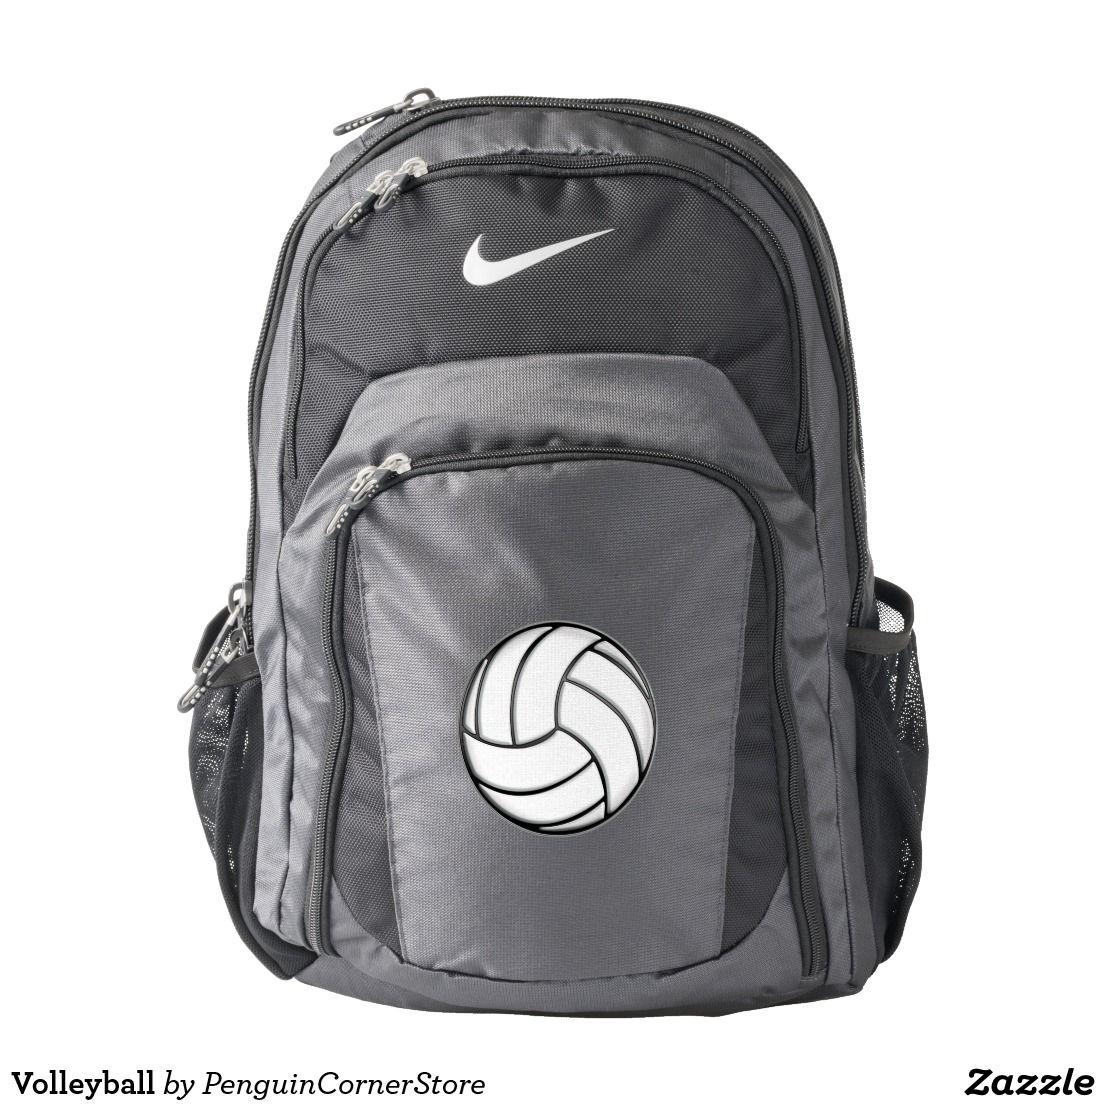 Volleyball Nike Backpack Zazzle Com Ropa De Voleibol Deportes De Equipo Nike